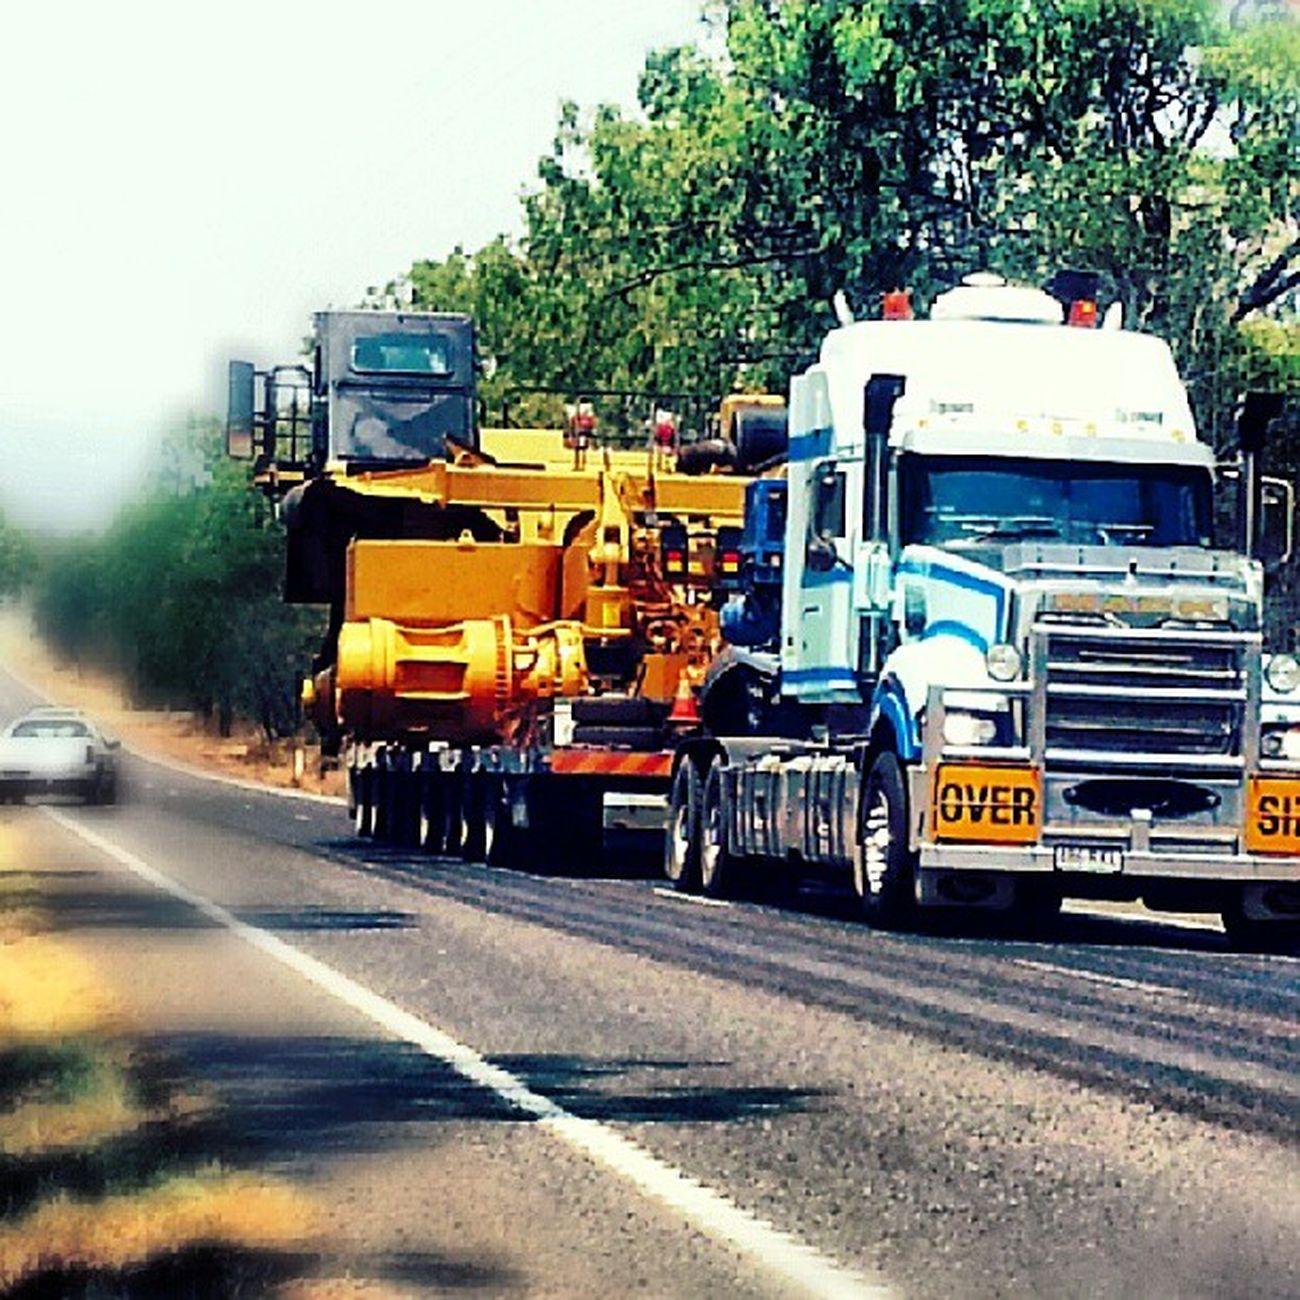 Semitrailer Scania Truck Semi trucks v8 trailerfoto trailer trailerphoto engine roadtrain road vabis instagram instapic igers blue primeshots kingoftheroad hanestad diesel transport logistics mercedes haulage cat machinery moranbah